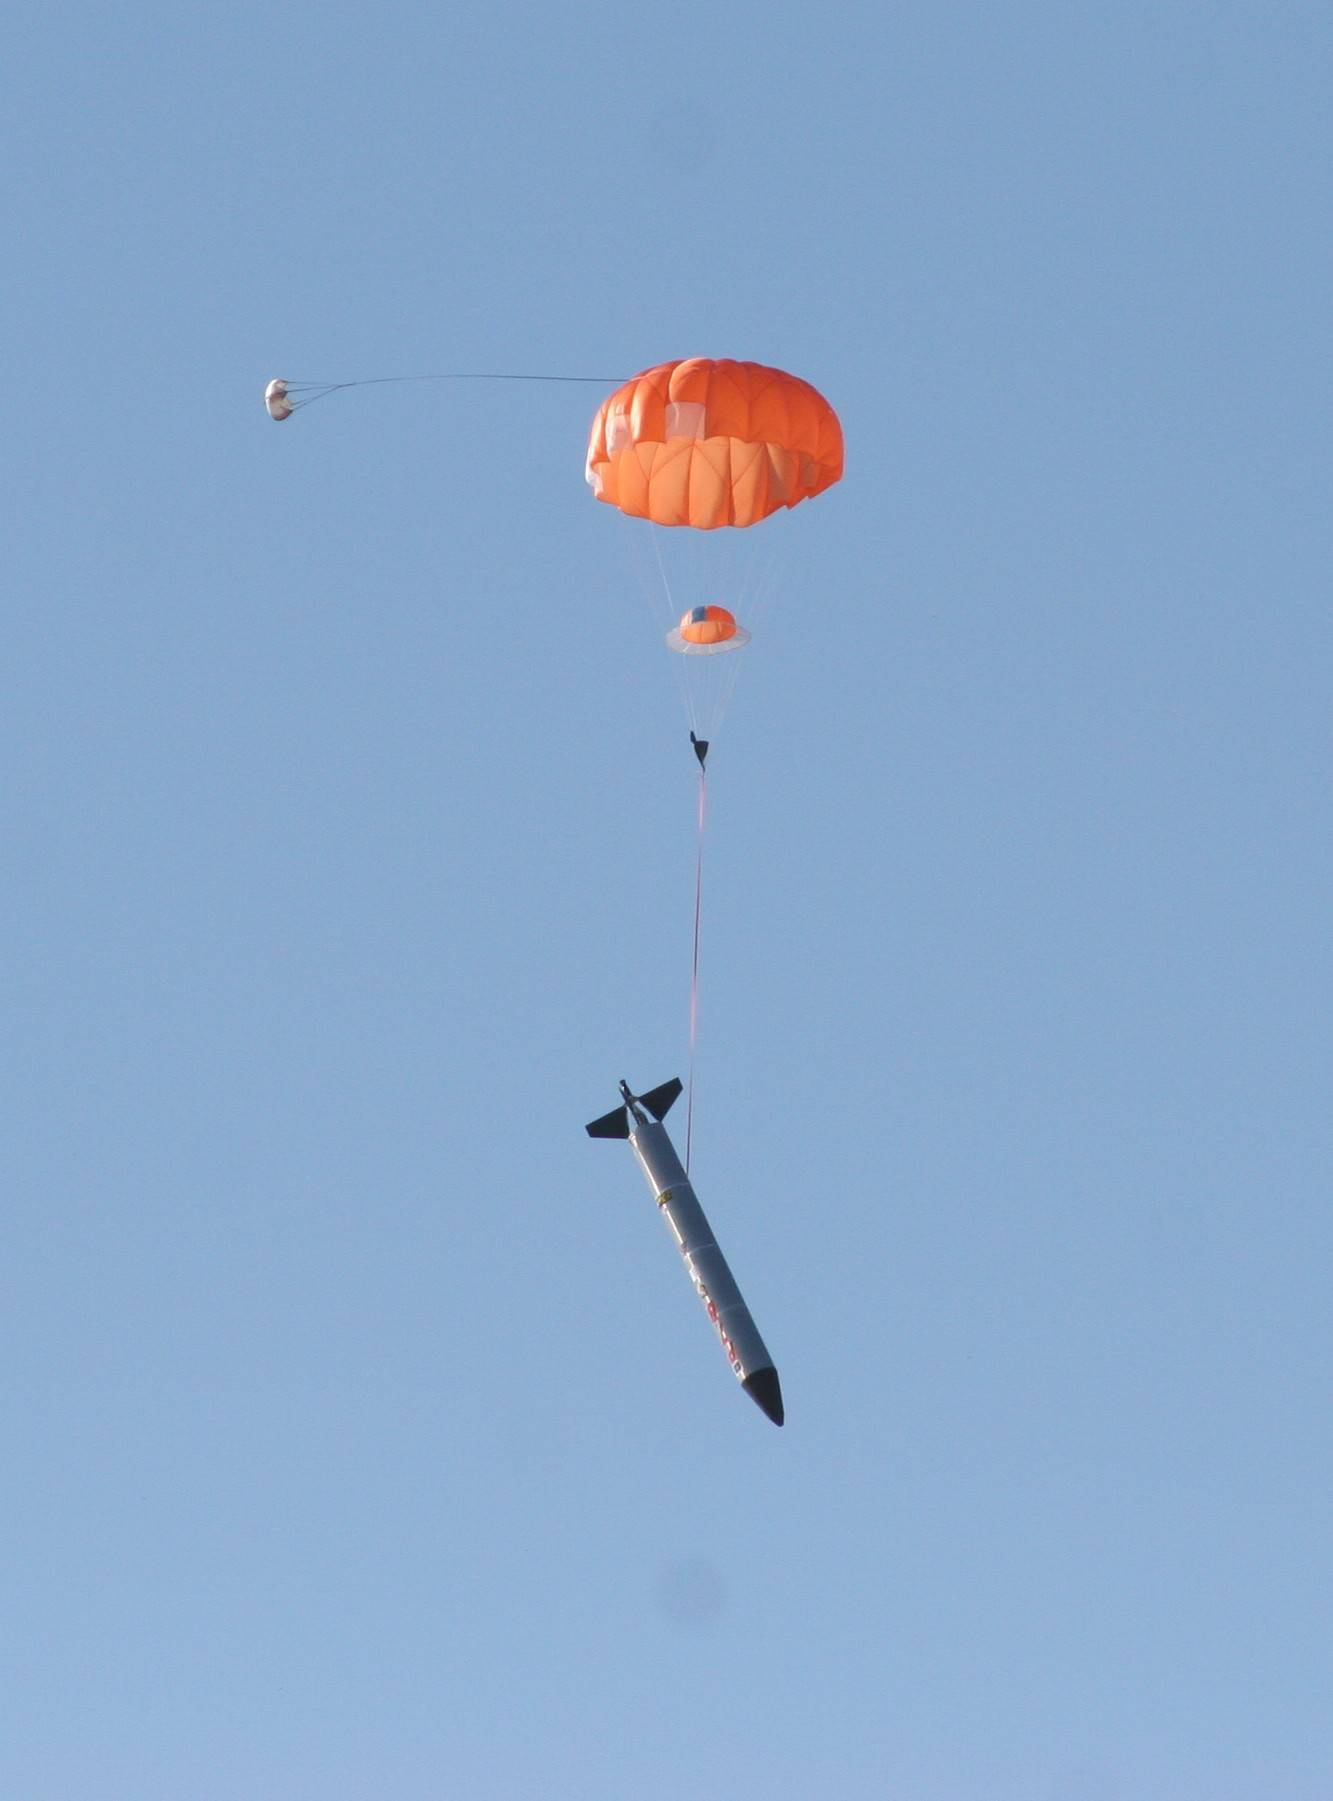 Rocket sonde parachute